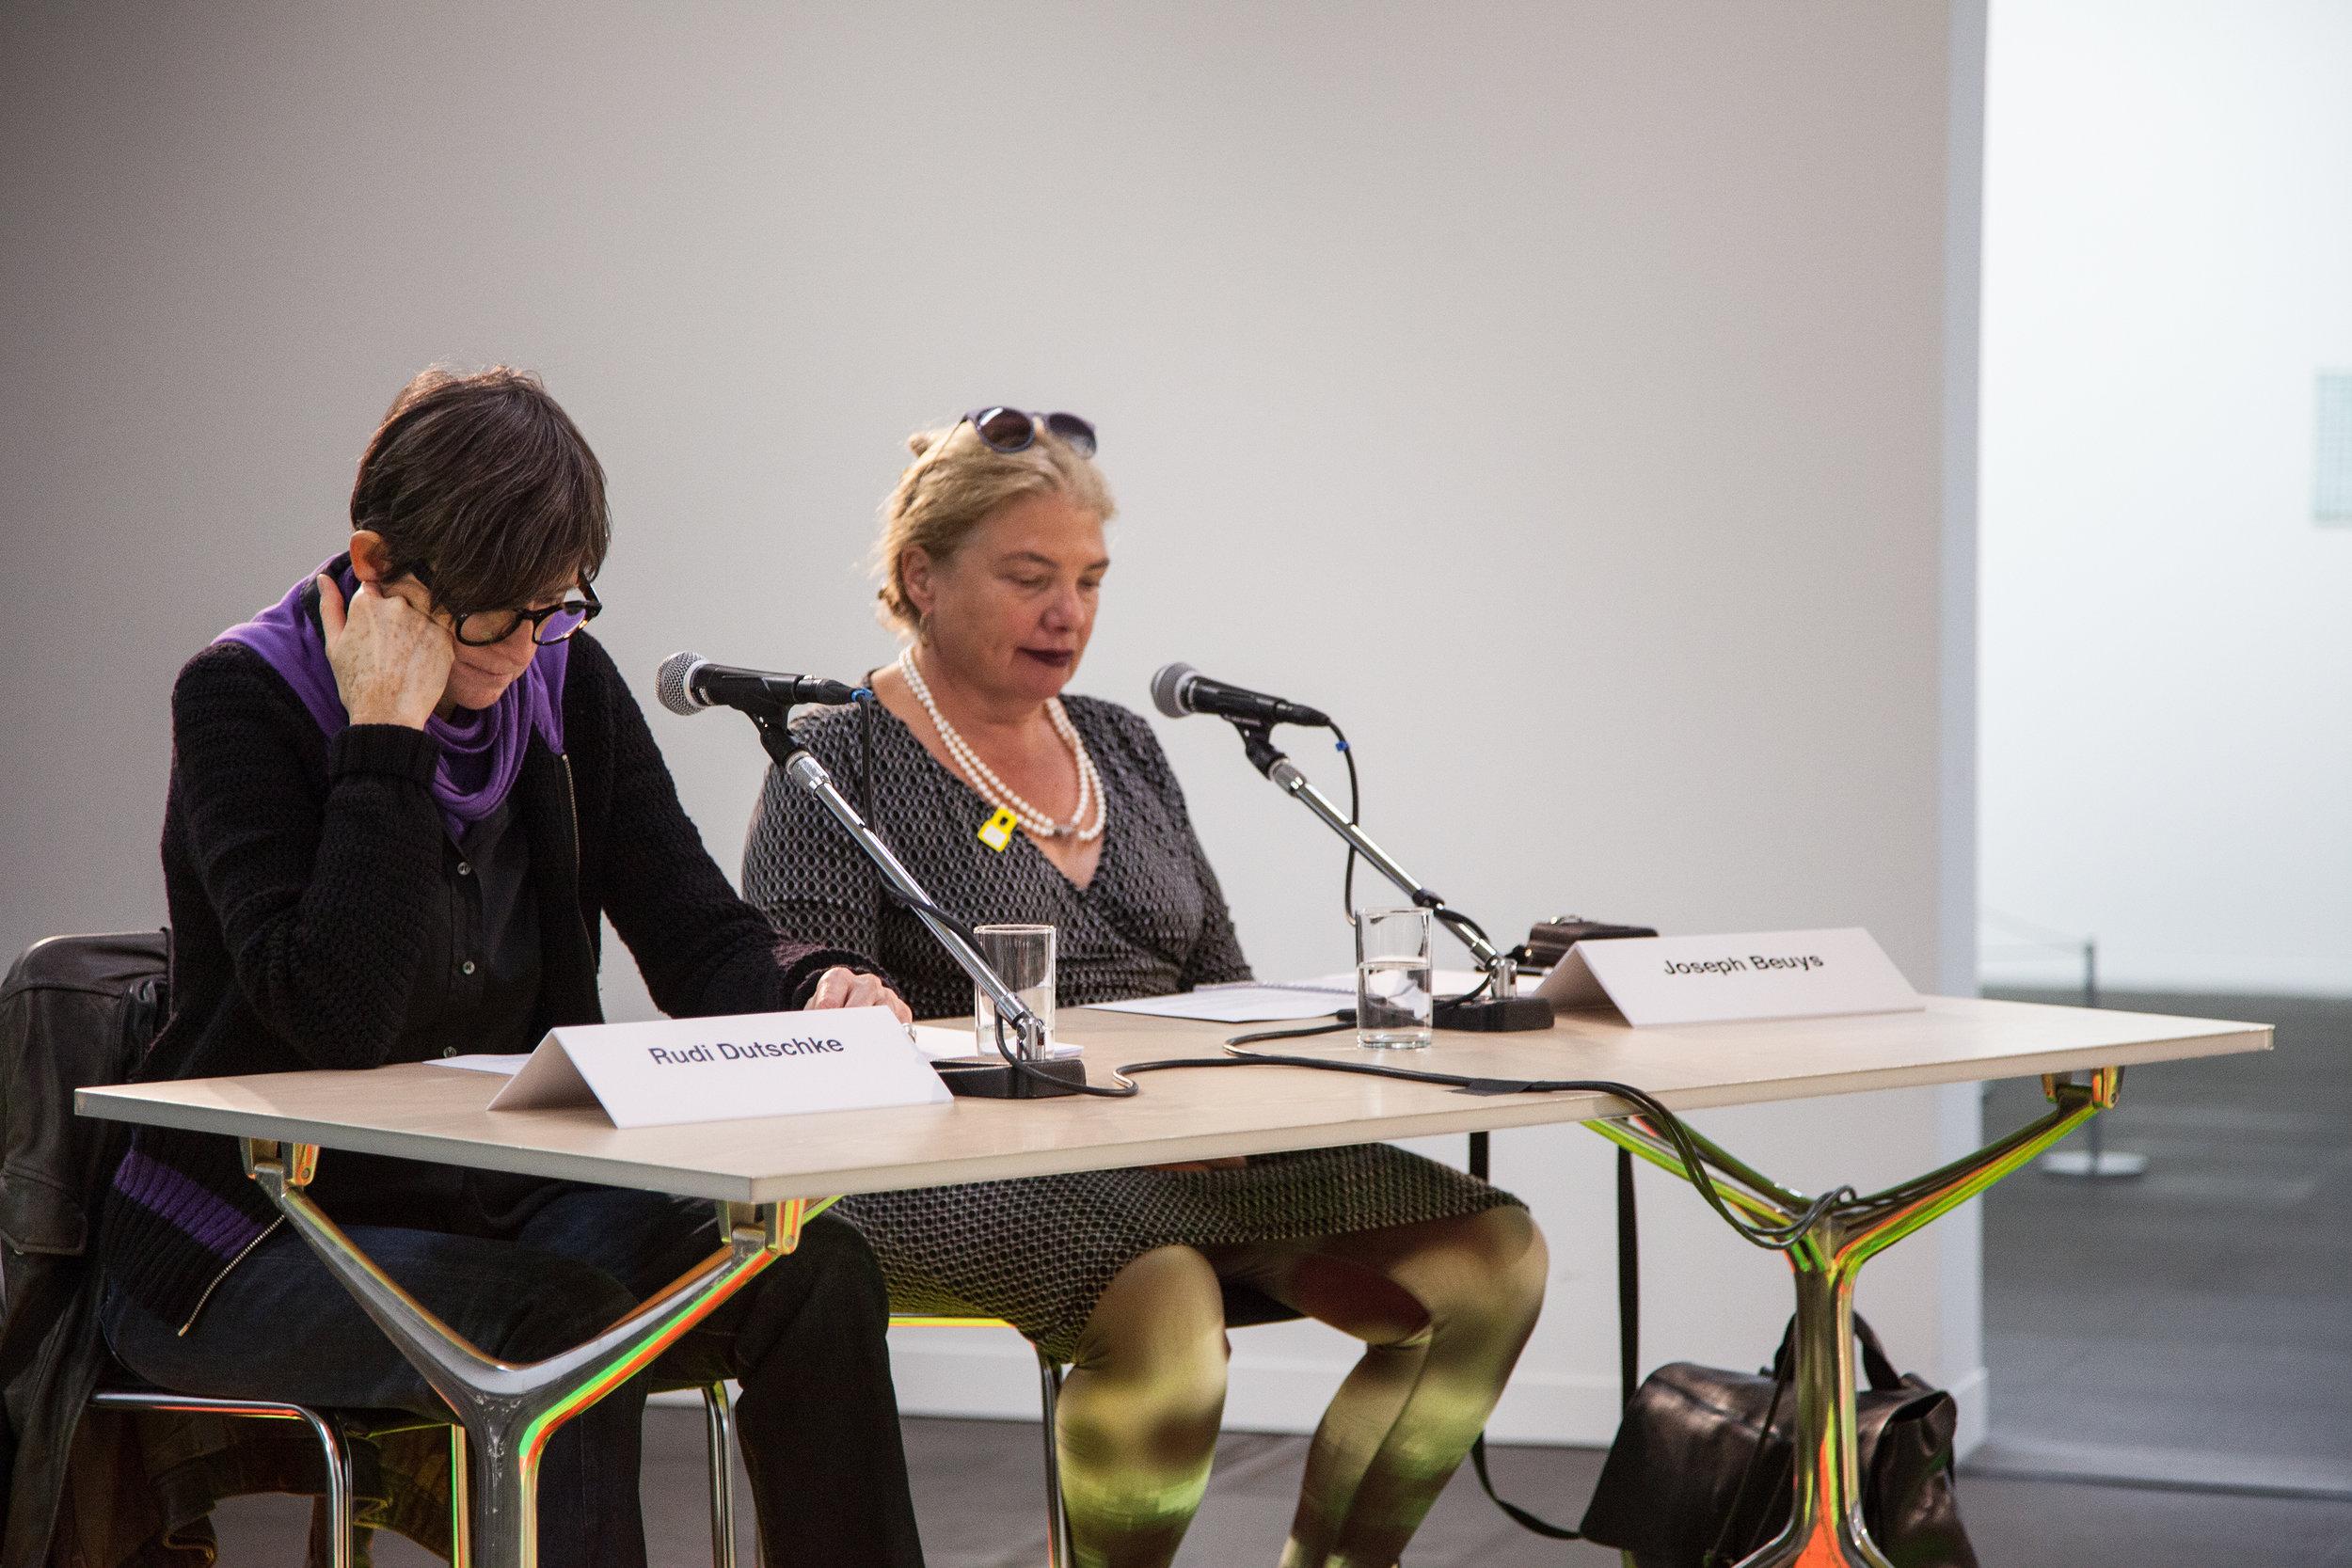 Gisela Kleinlein and Nele Ströbel